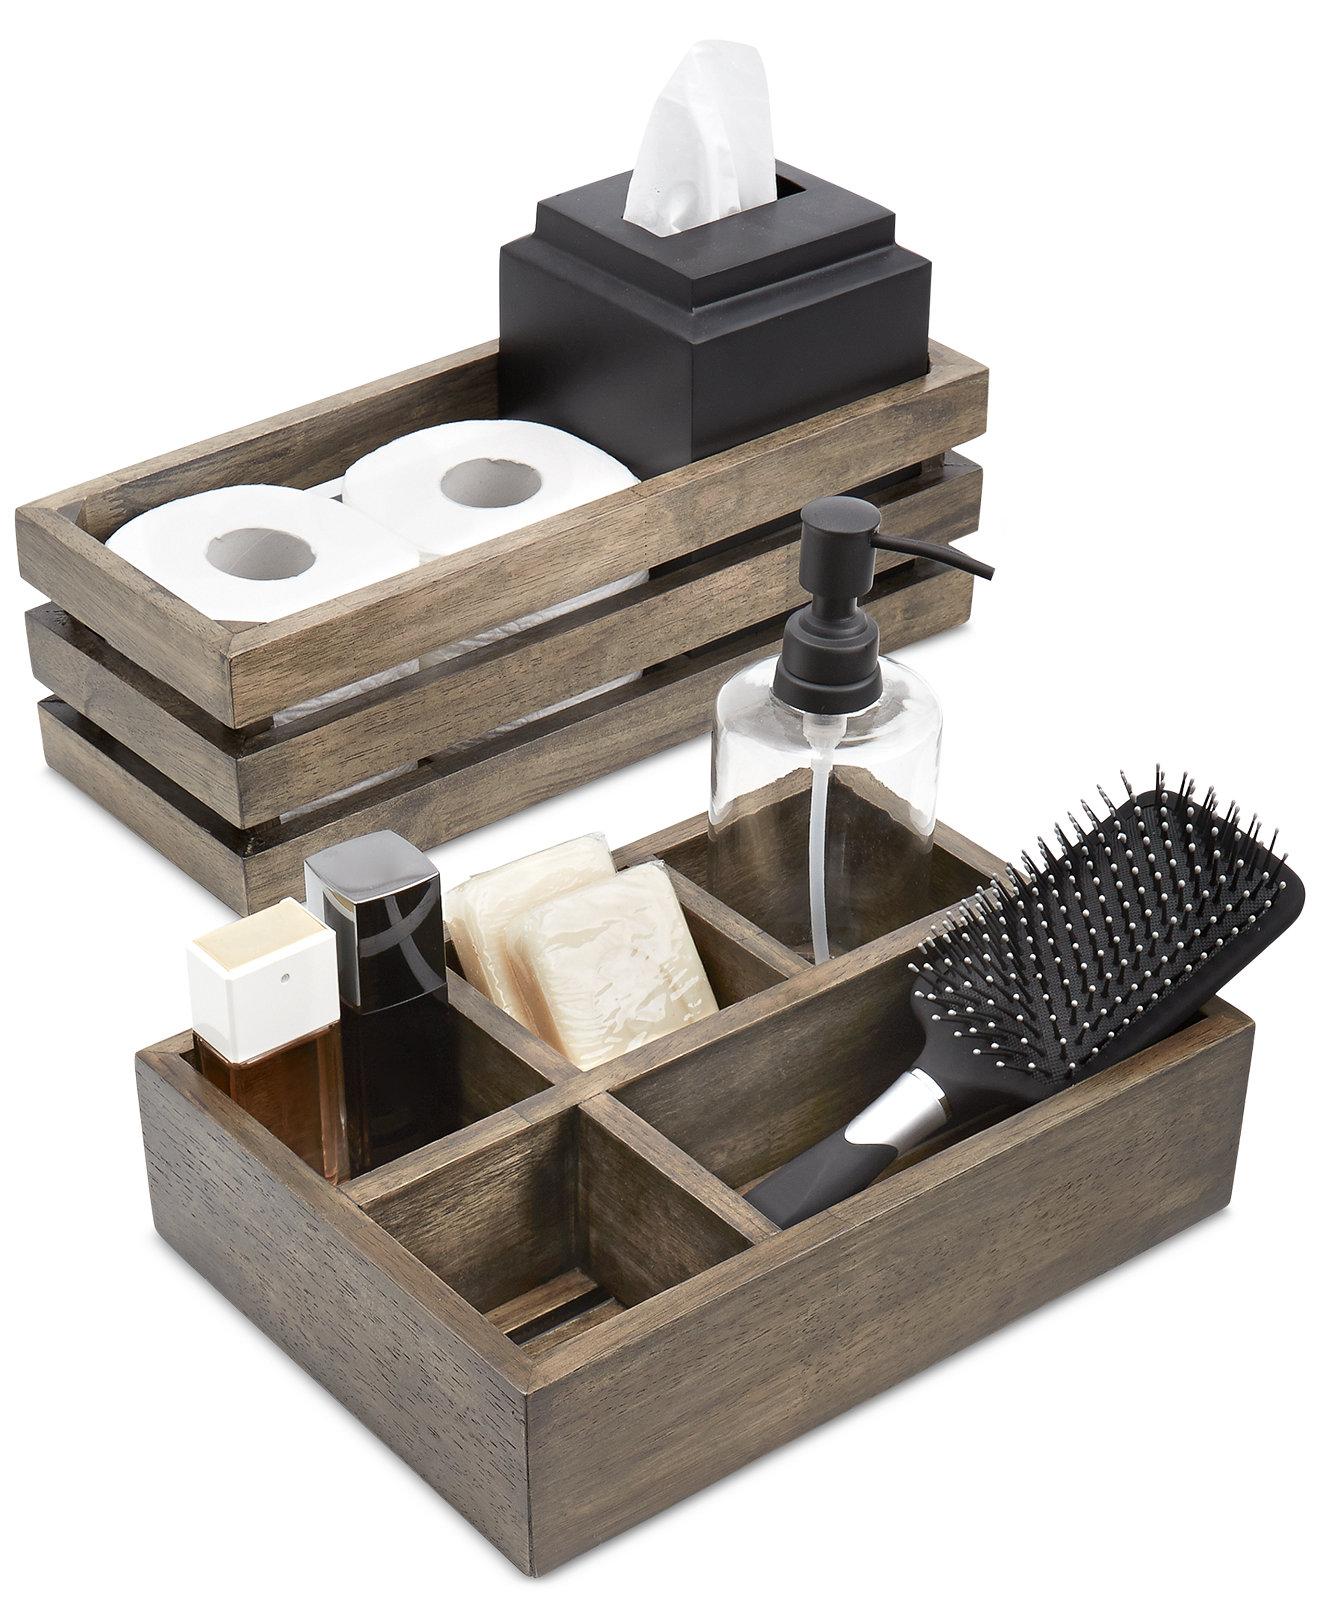 Fine bathroom accessories - Paradigm Driftwood Bath Accessories